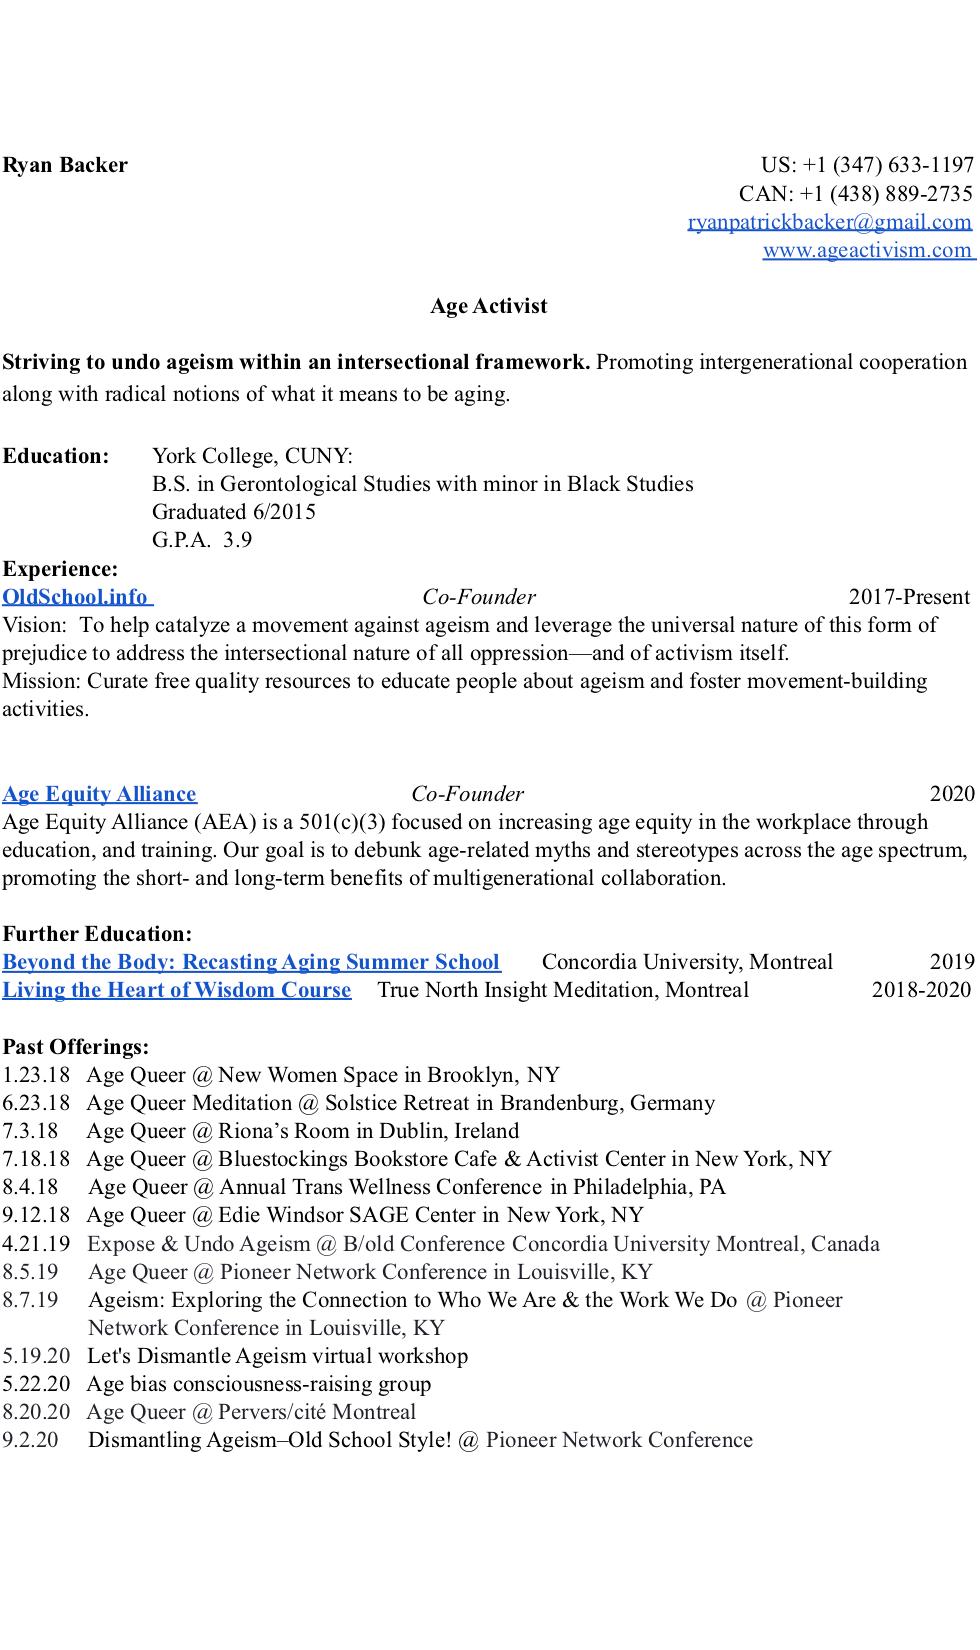 Backer CV March 2020.png